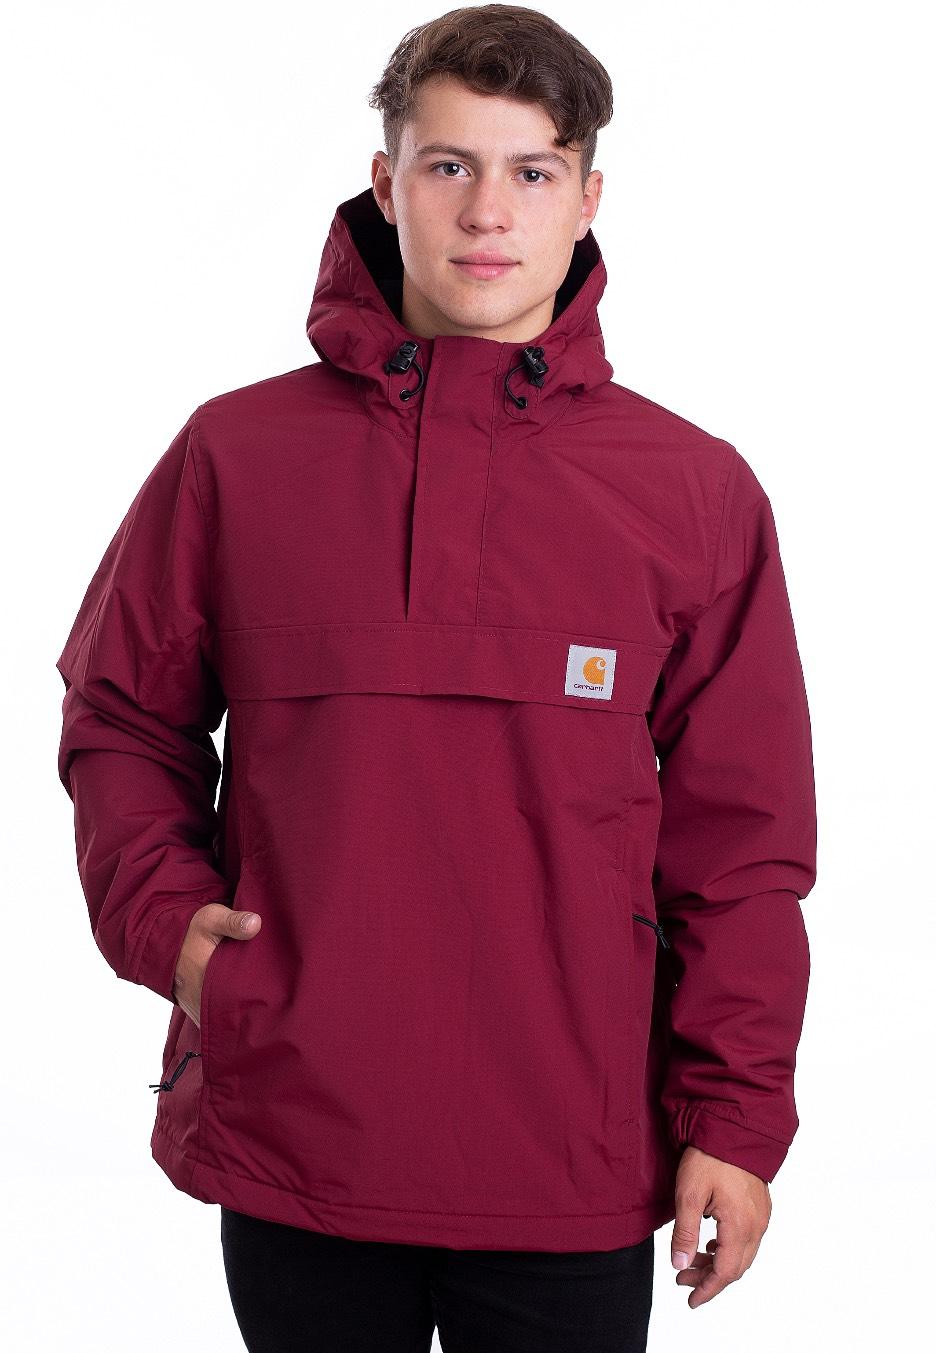 c53c4b16bd6 Carhartt WIP - Nimbus Mulberry Winter - Jacket - Streetwear Shop -  Impericon.com Worldwide